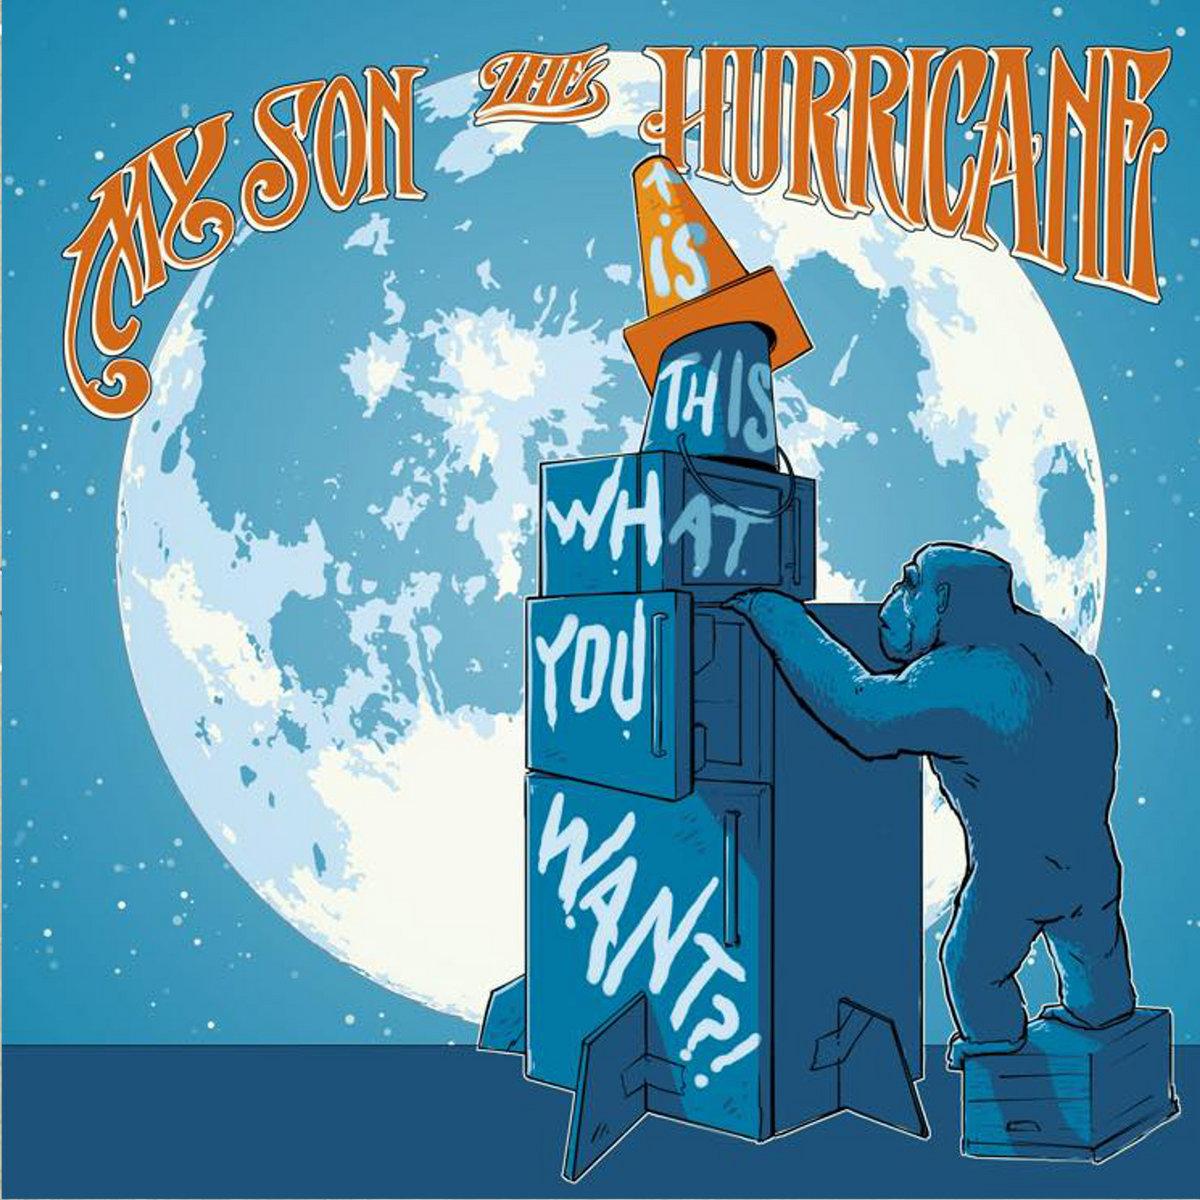 Birthday Cake (w/ Sammi Morelli) | My Son The Hurricane